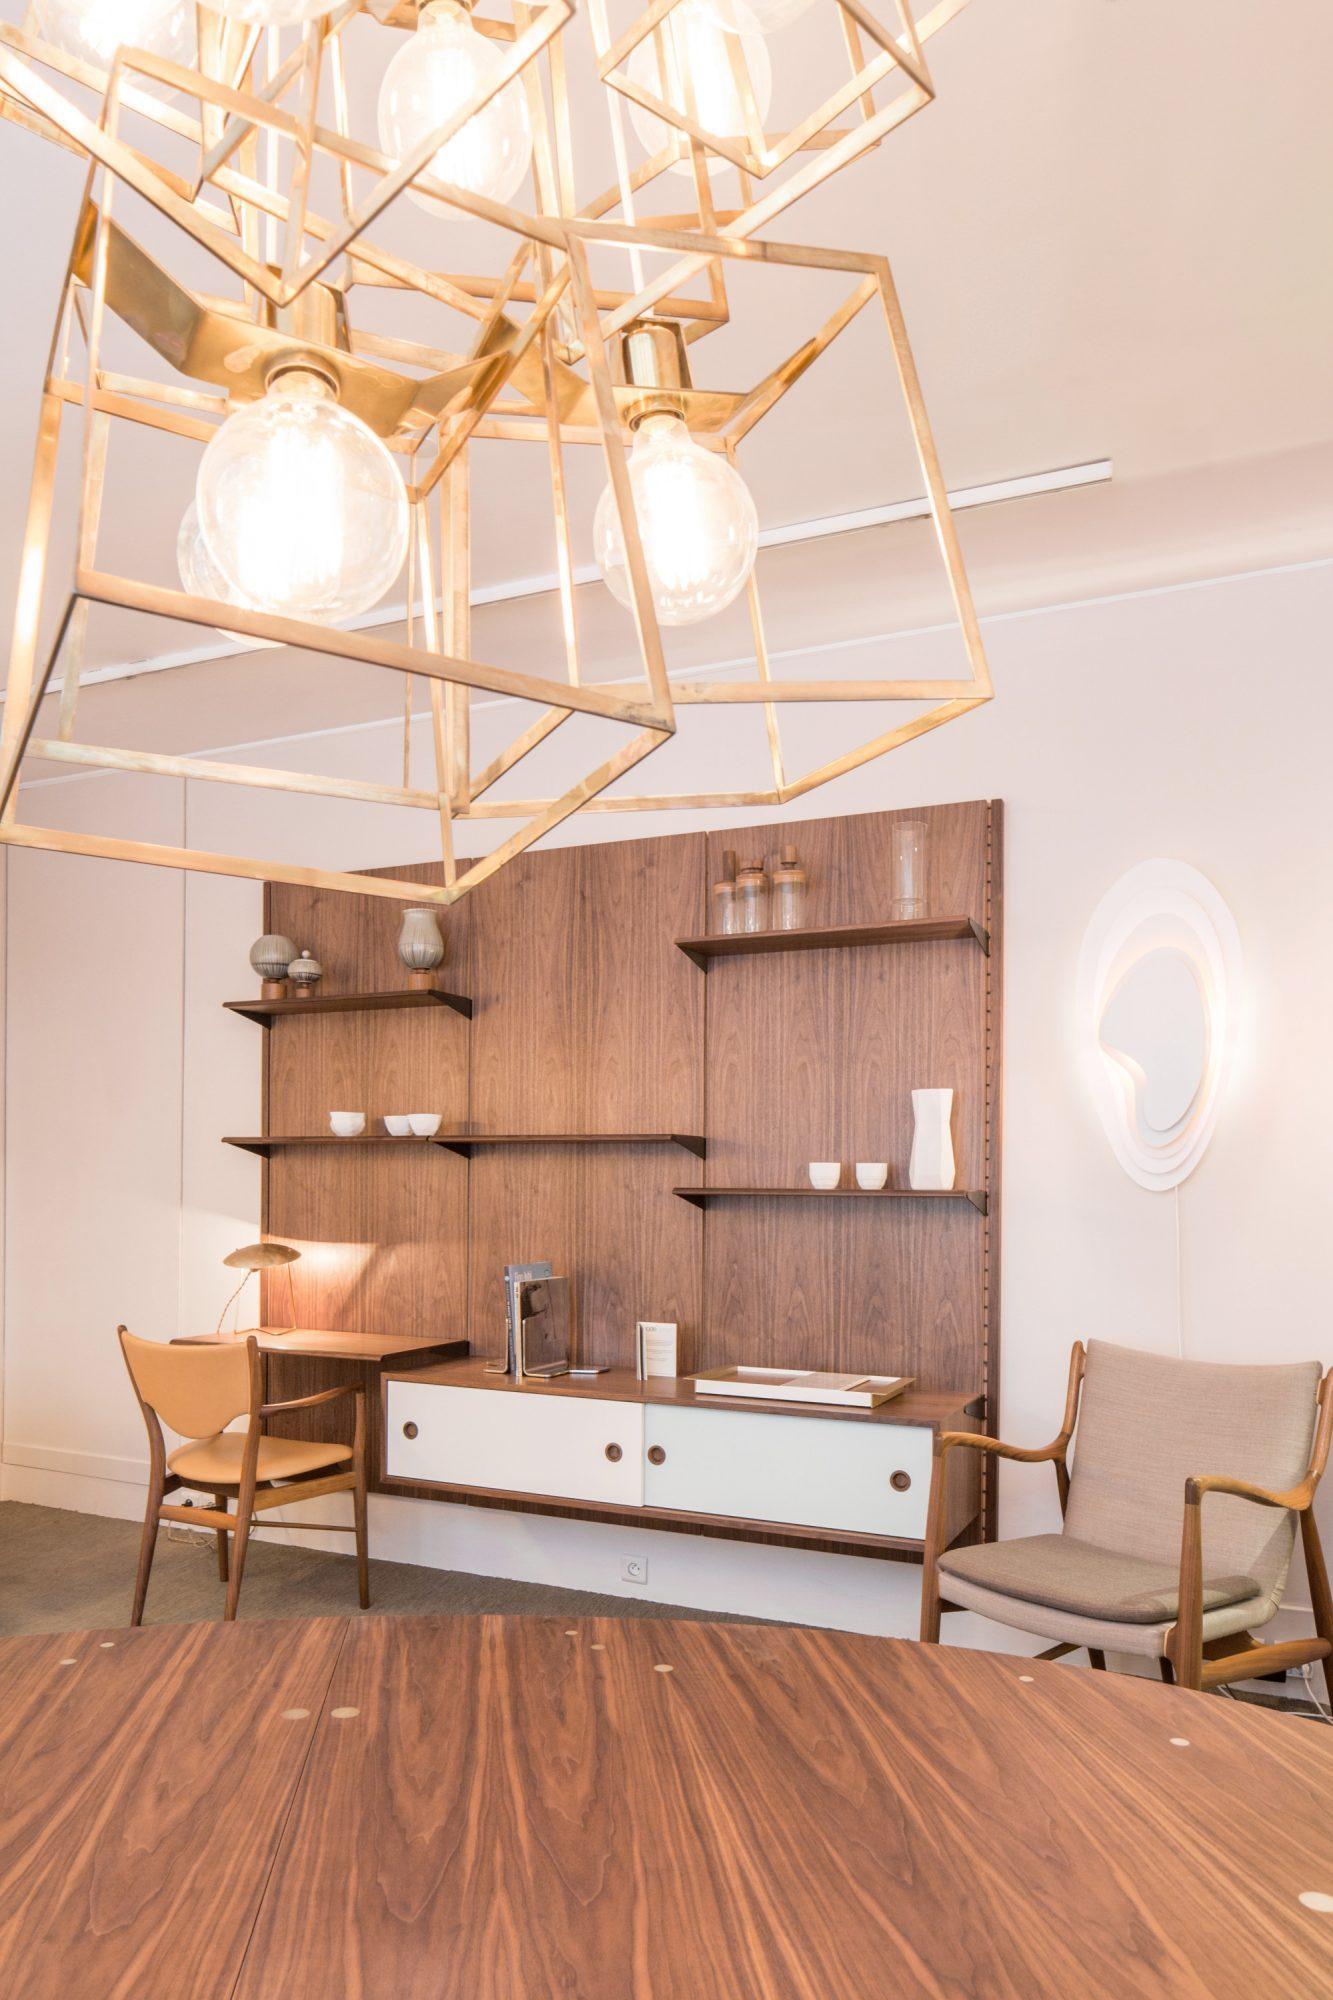 Showroom, Triode, Paris, France